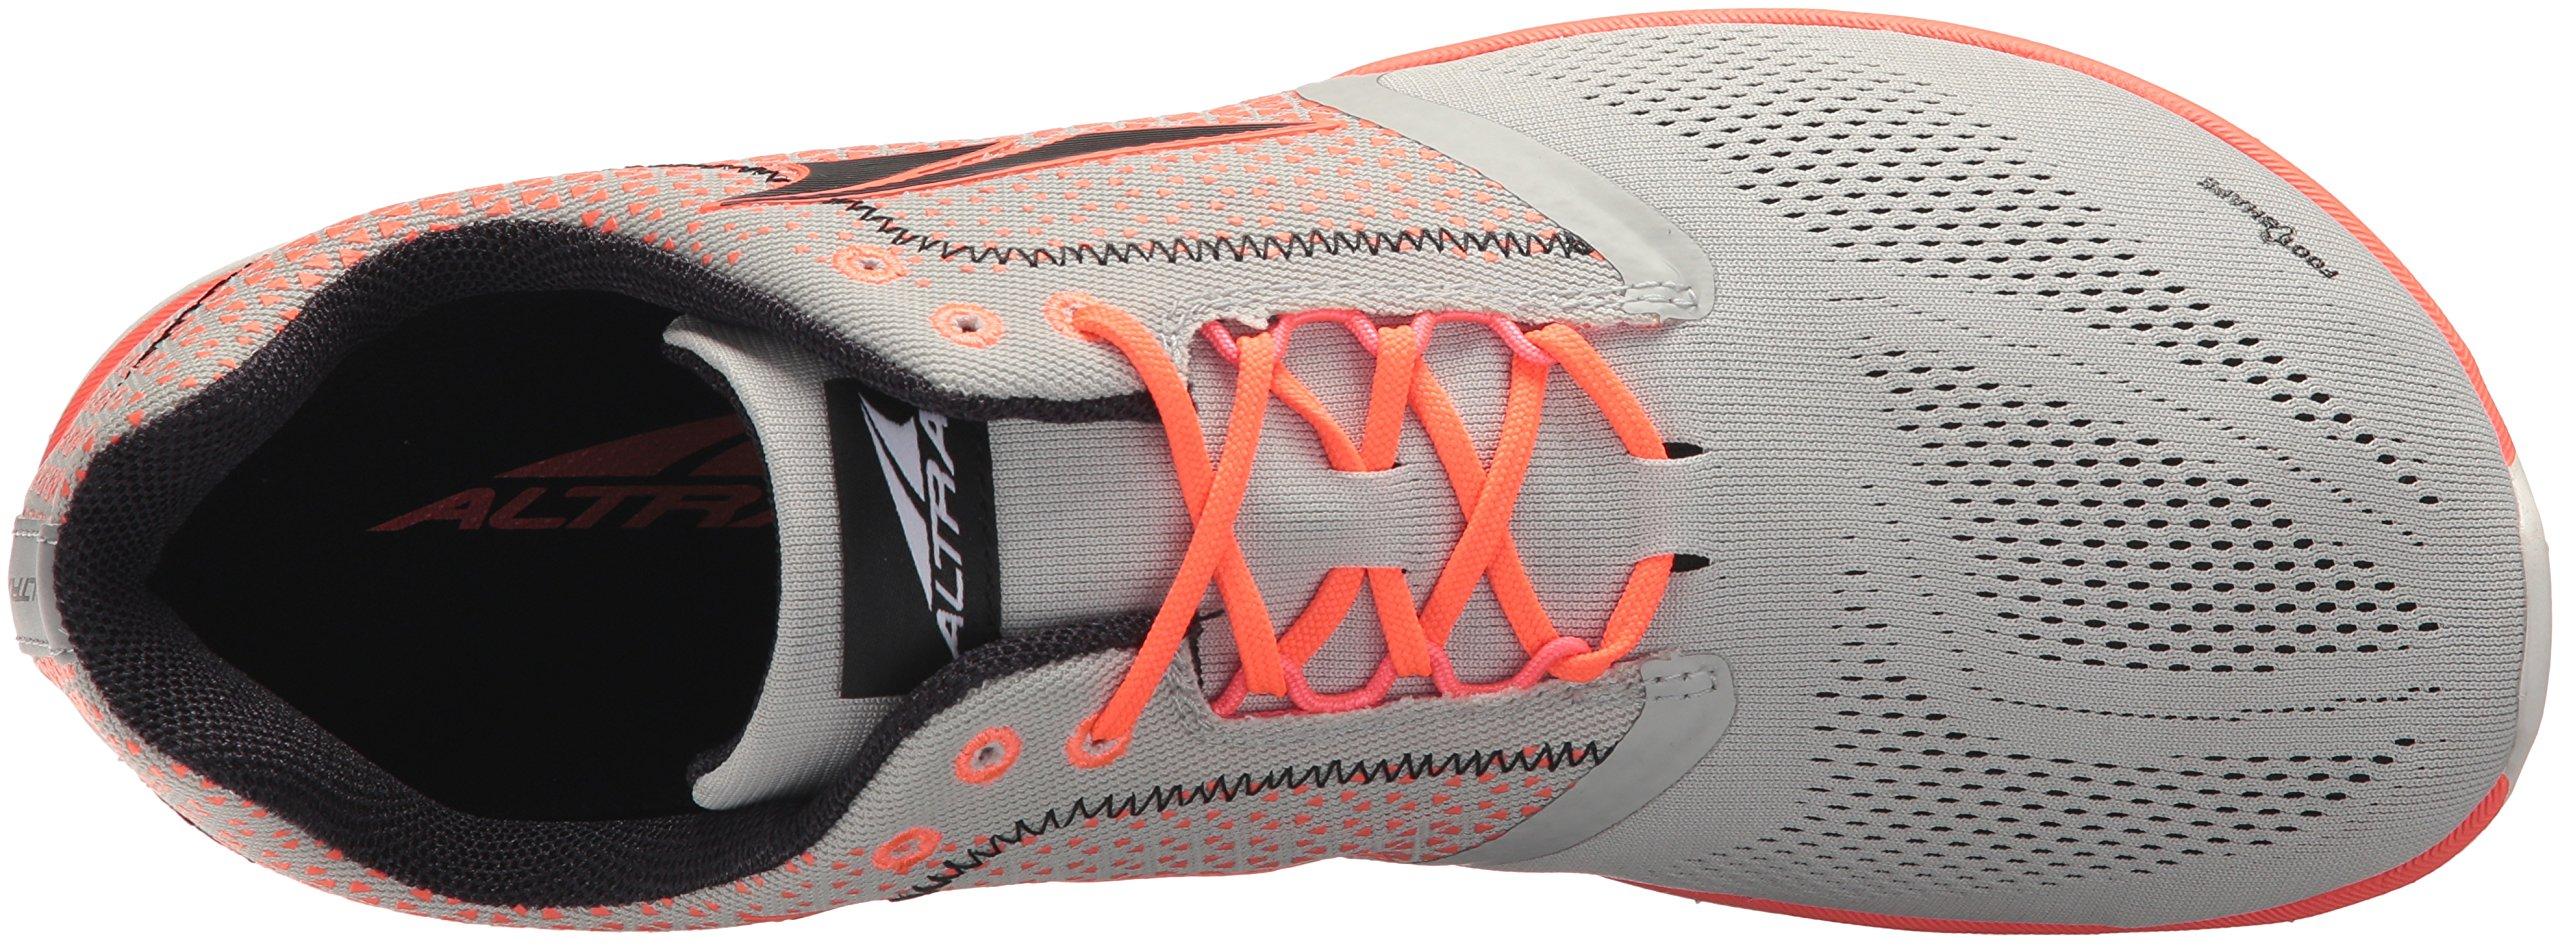 Altra Men's Solstice Sneaker, Orange, 7 Regular US by Altra (Image #7)